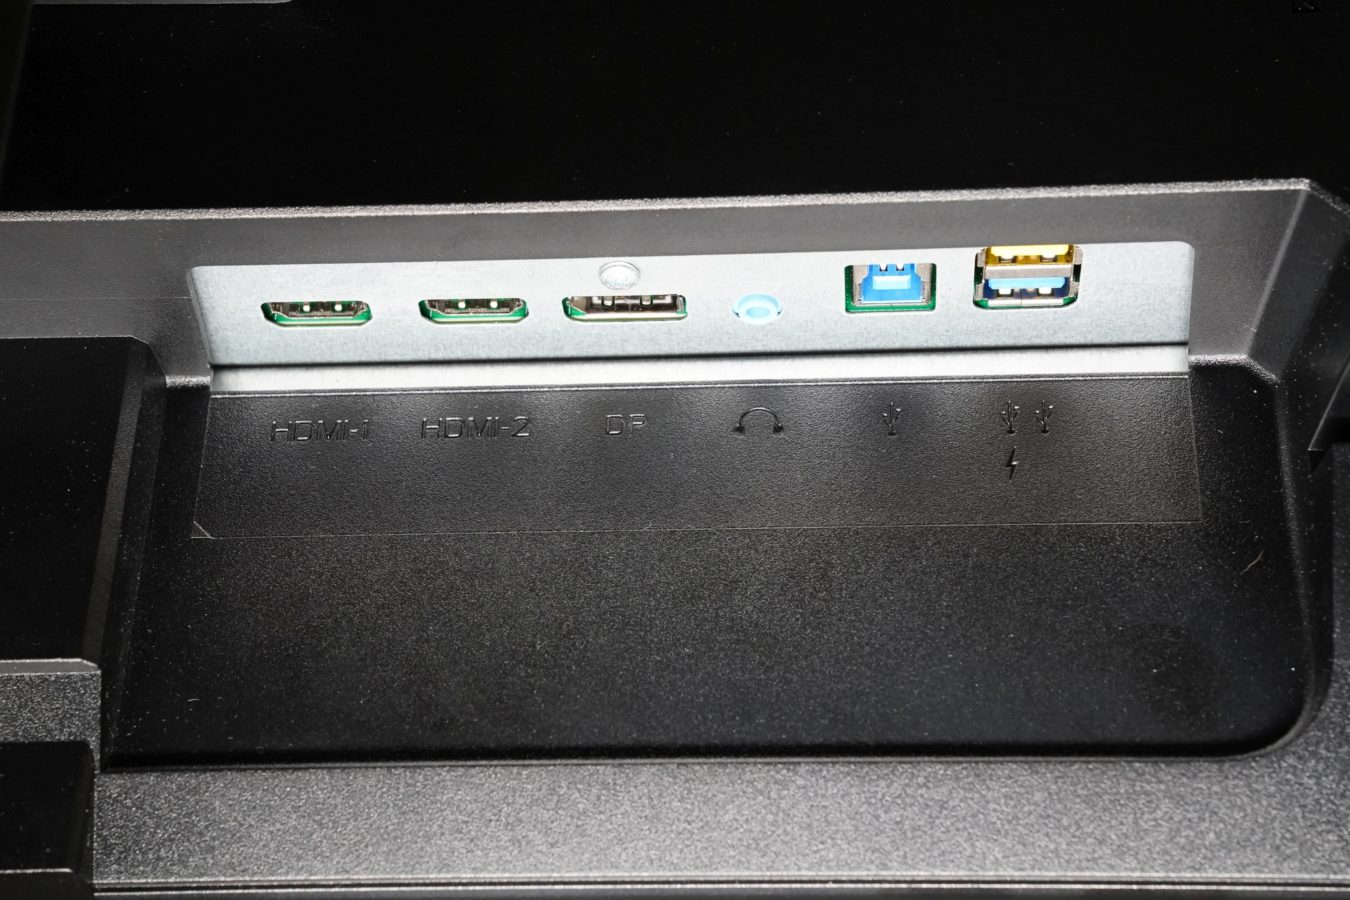 Recenzja iiyama ProLite XUB3493WQSU - drogi, ale fajny monitor! 32 iiyama ProLite XUB3493WQSU